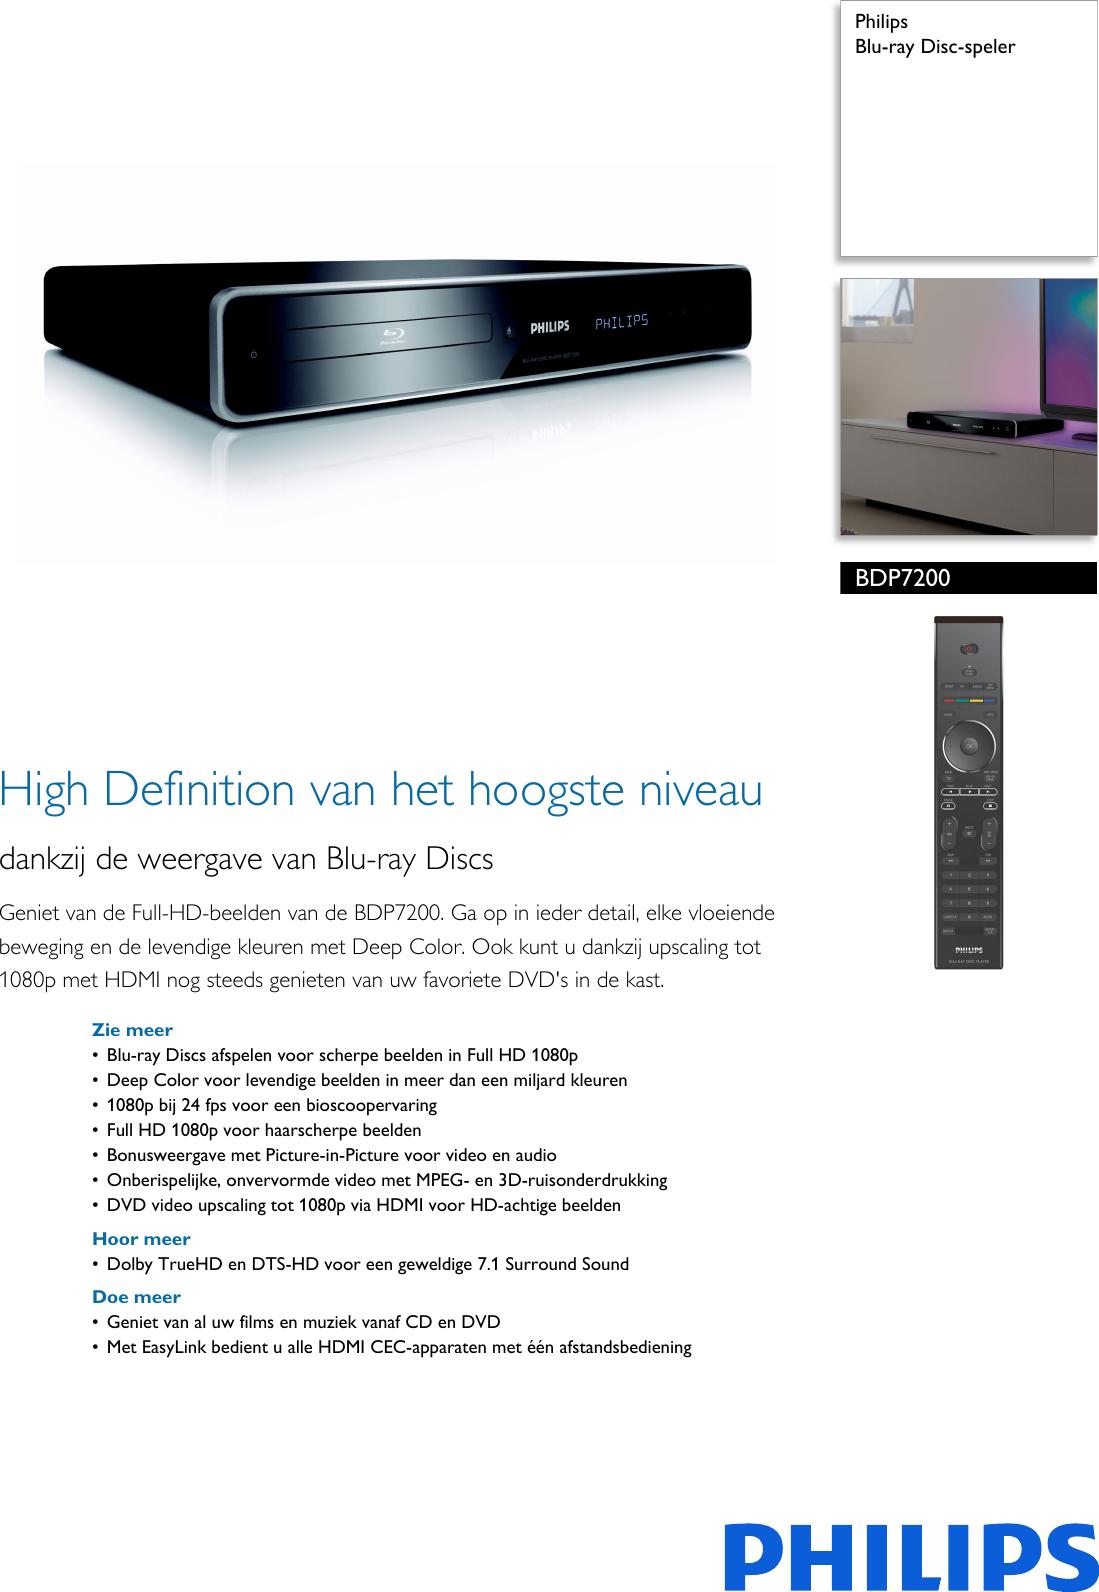 Philips Bdp720012 Blu Ray Disc Speler User Manual Brochure